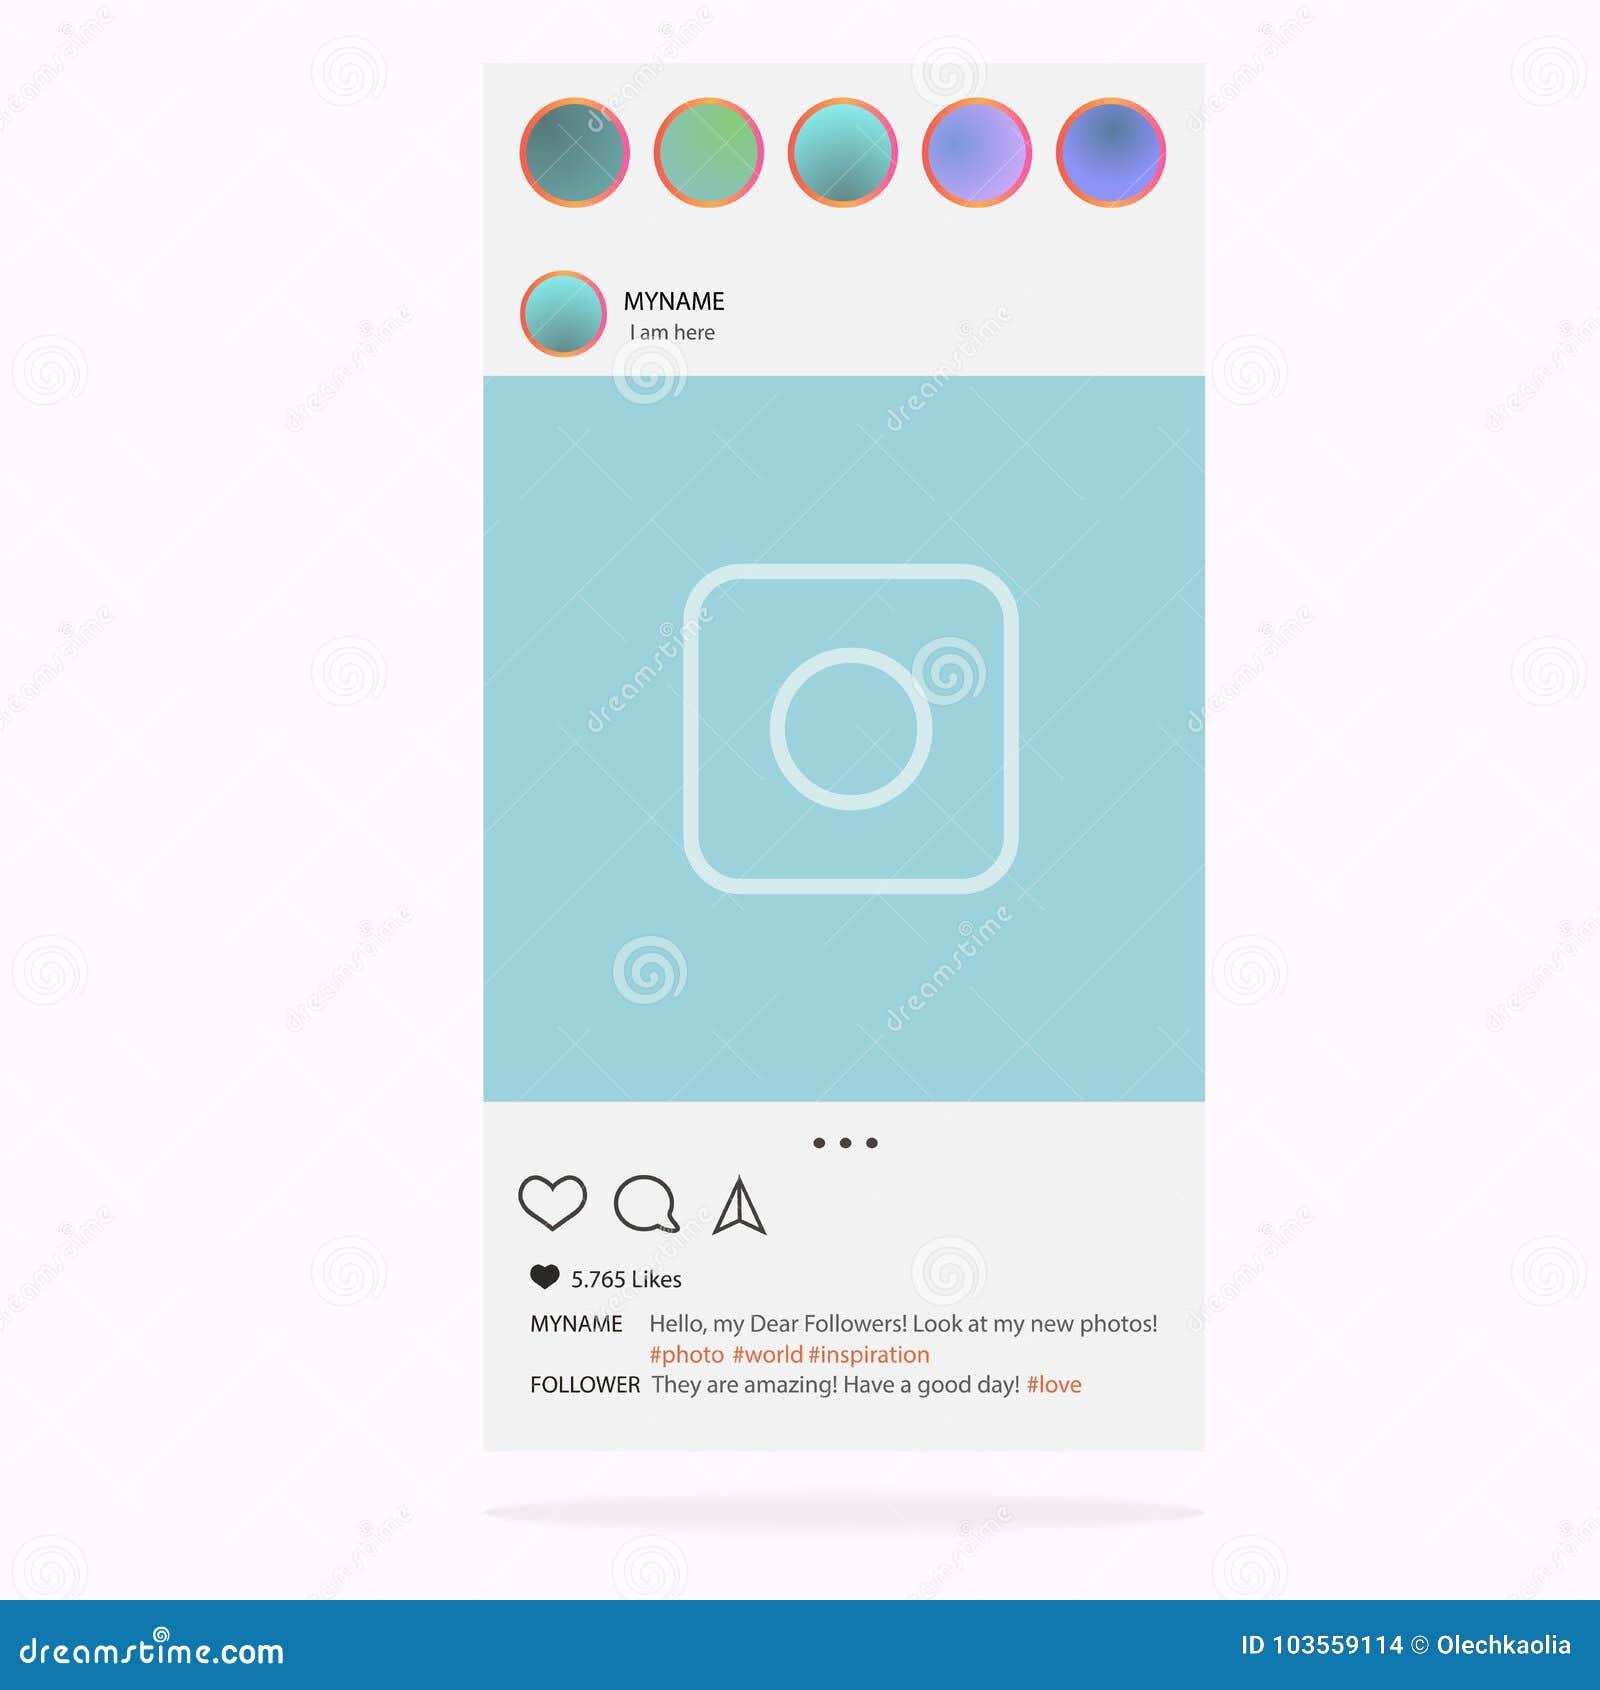 Vector Illustration Instagram: Instagram. Photo Frame Vector For Application. Social